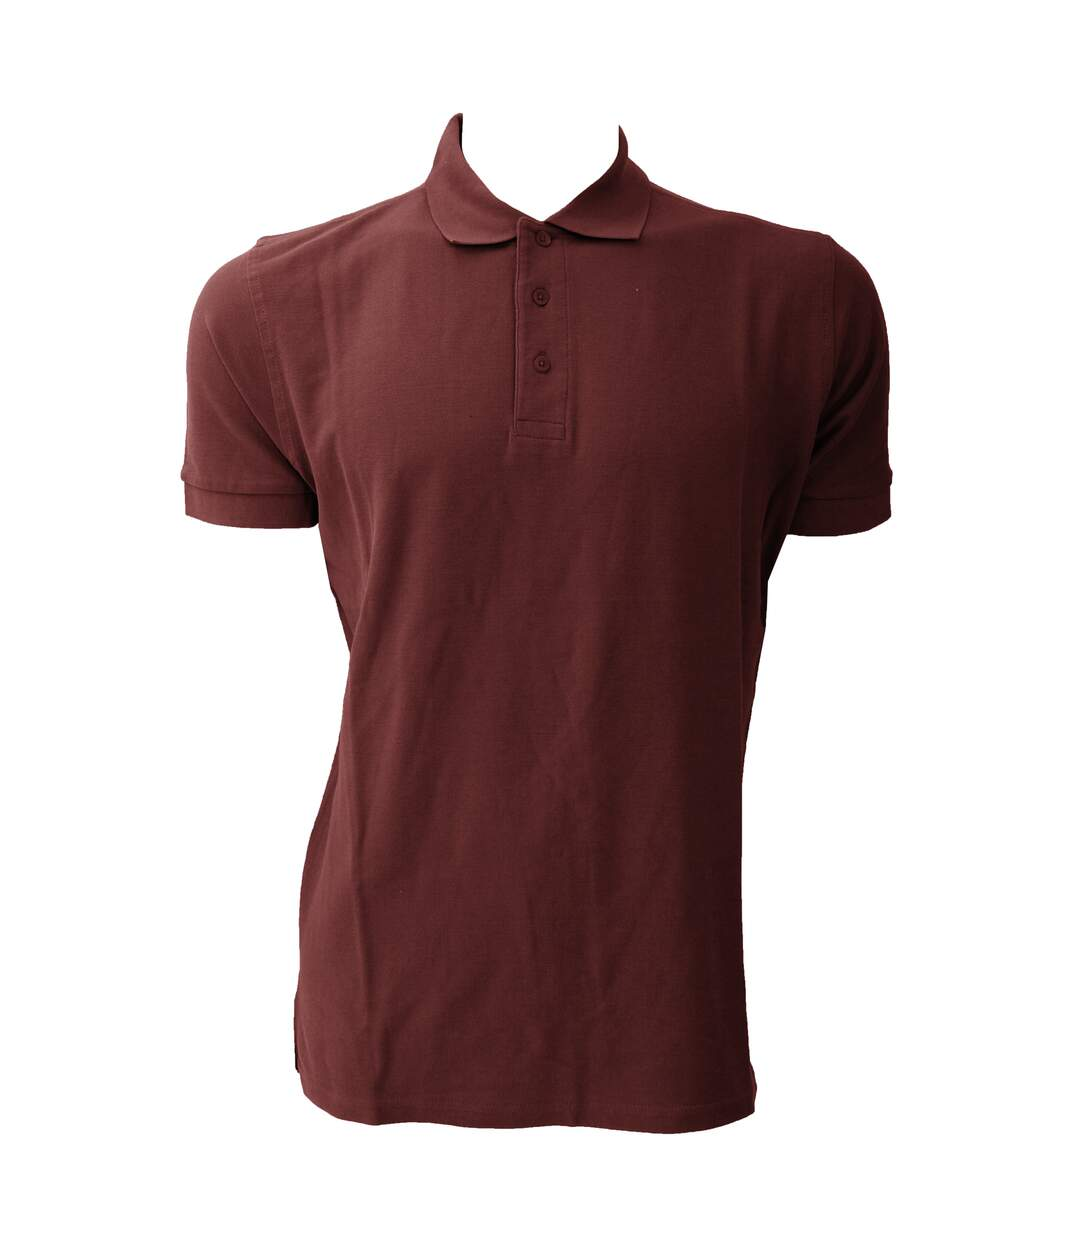 Jerzees Colours Mens Ultimate Cotton Short Sleeve Polo Shirt (Burgundy) - UTBC569